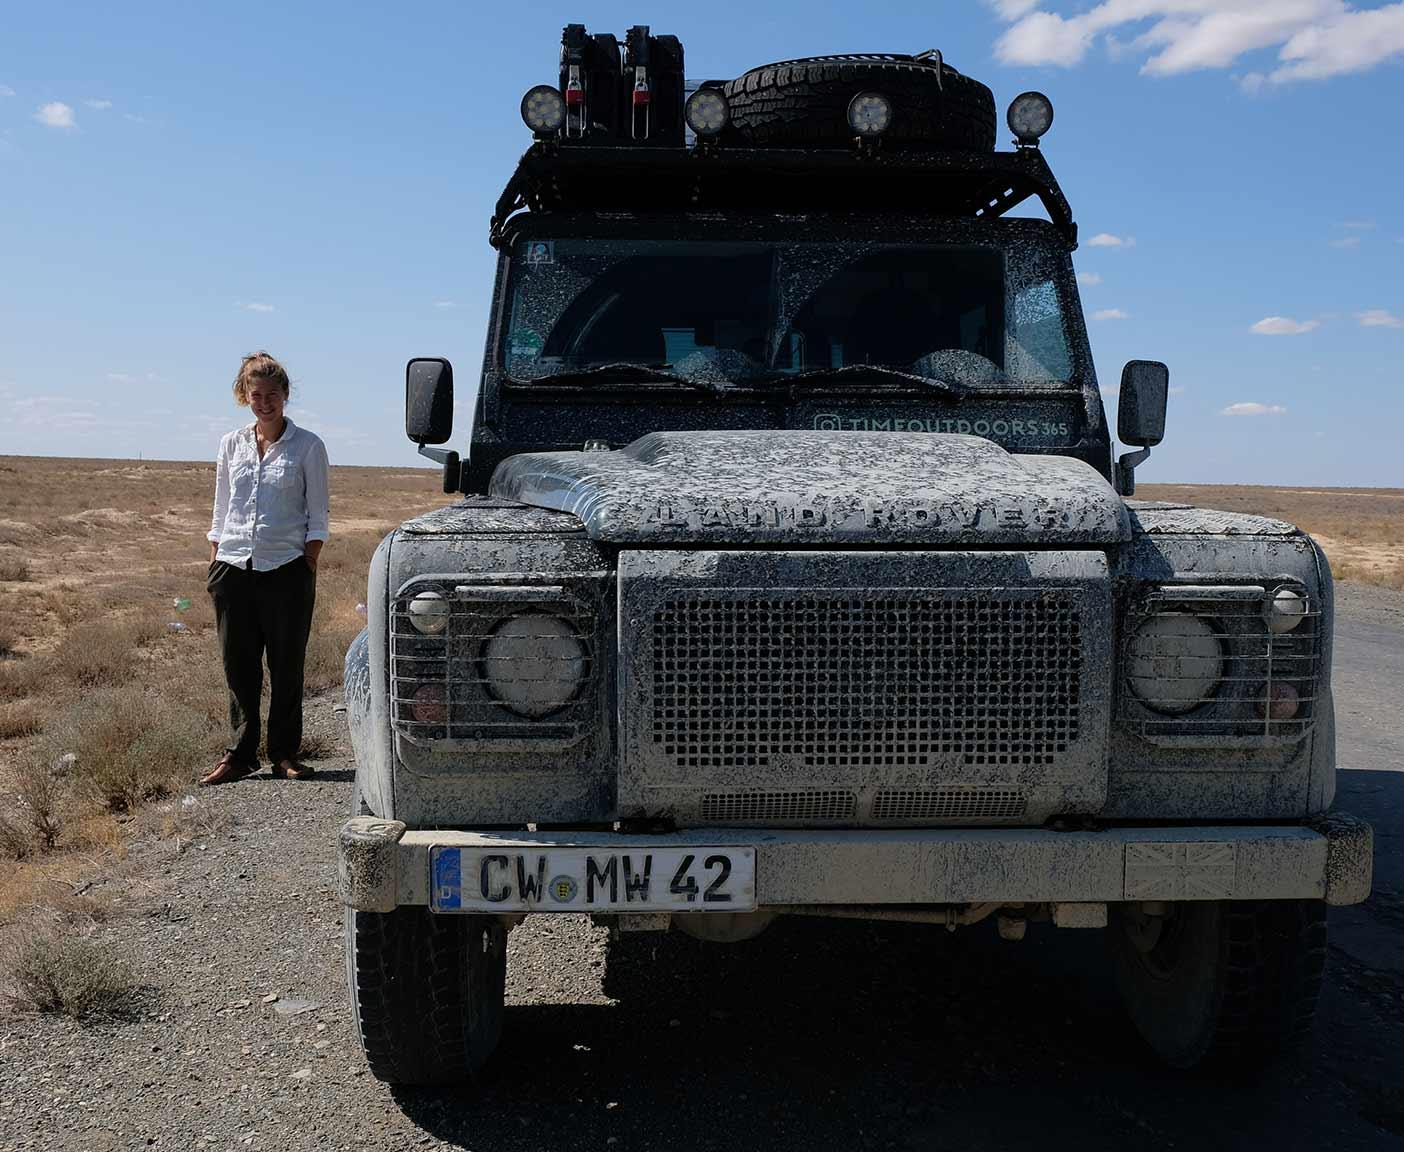 Land-Rover-Defender-110-td5-dachzelt-hard-top-zentralasien-station-wagon